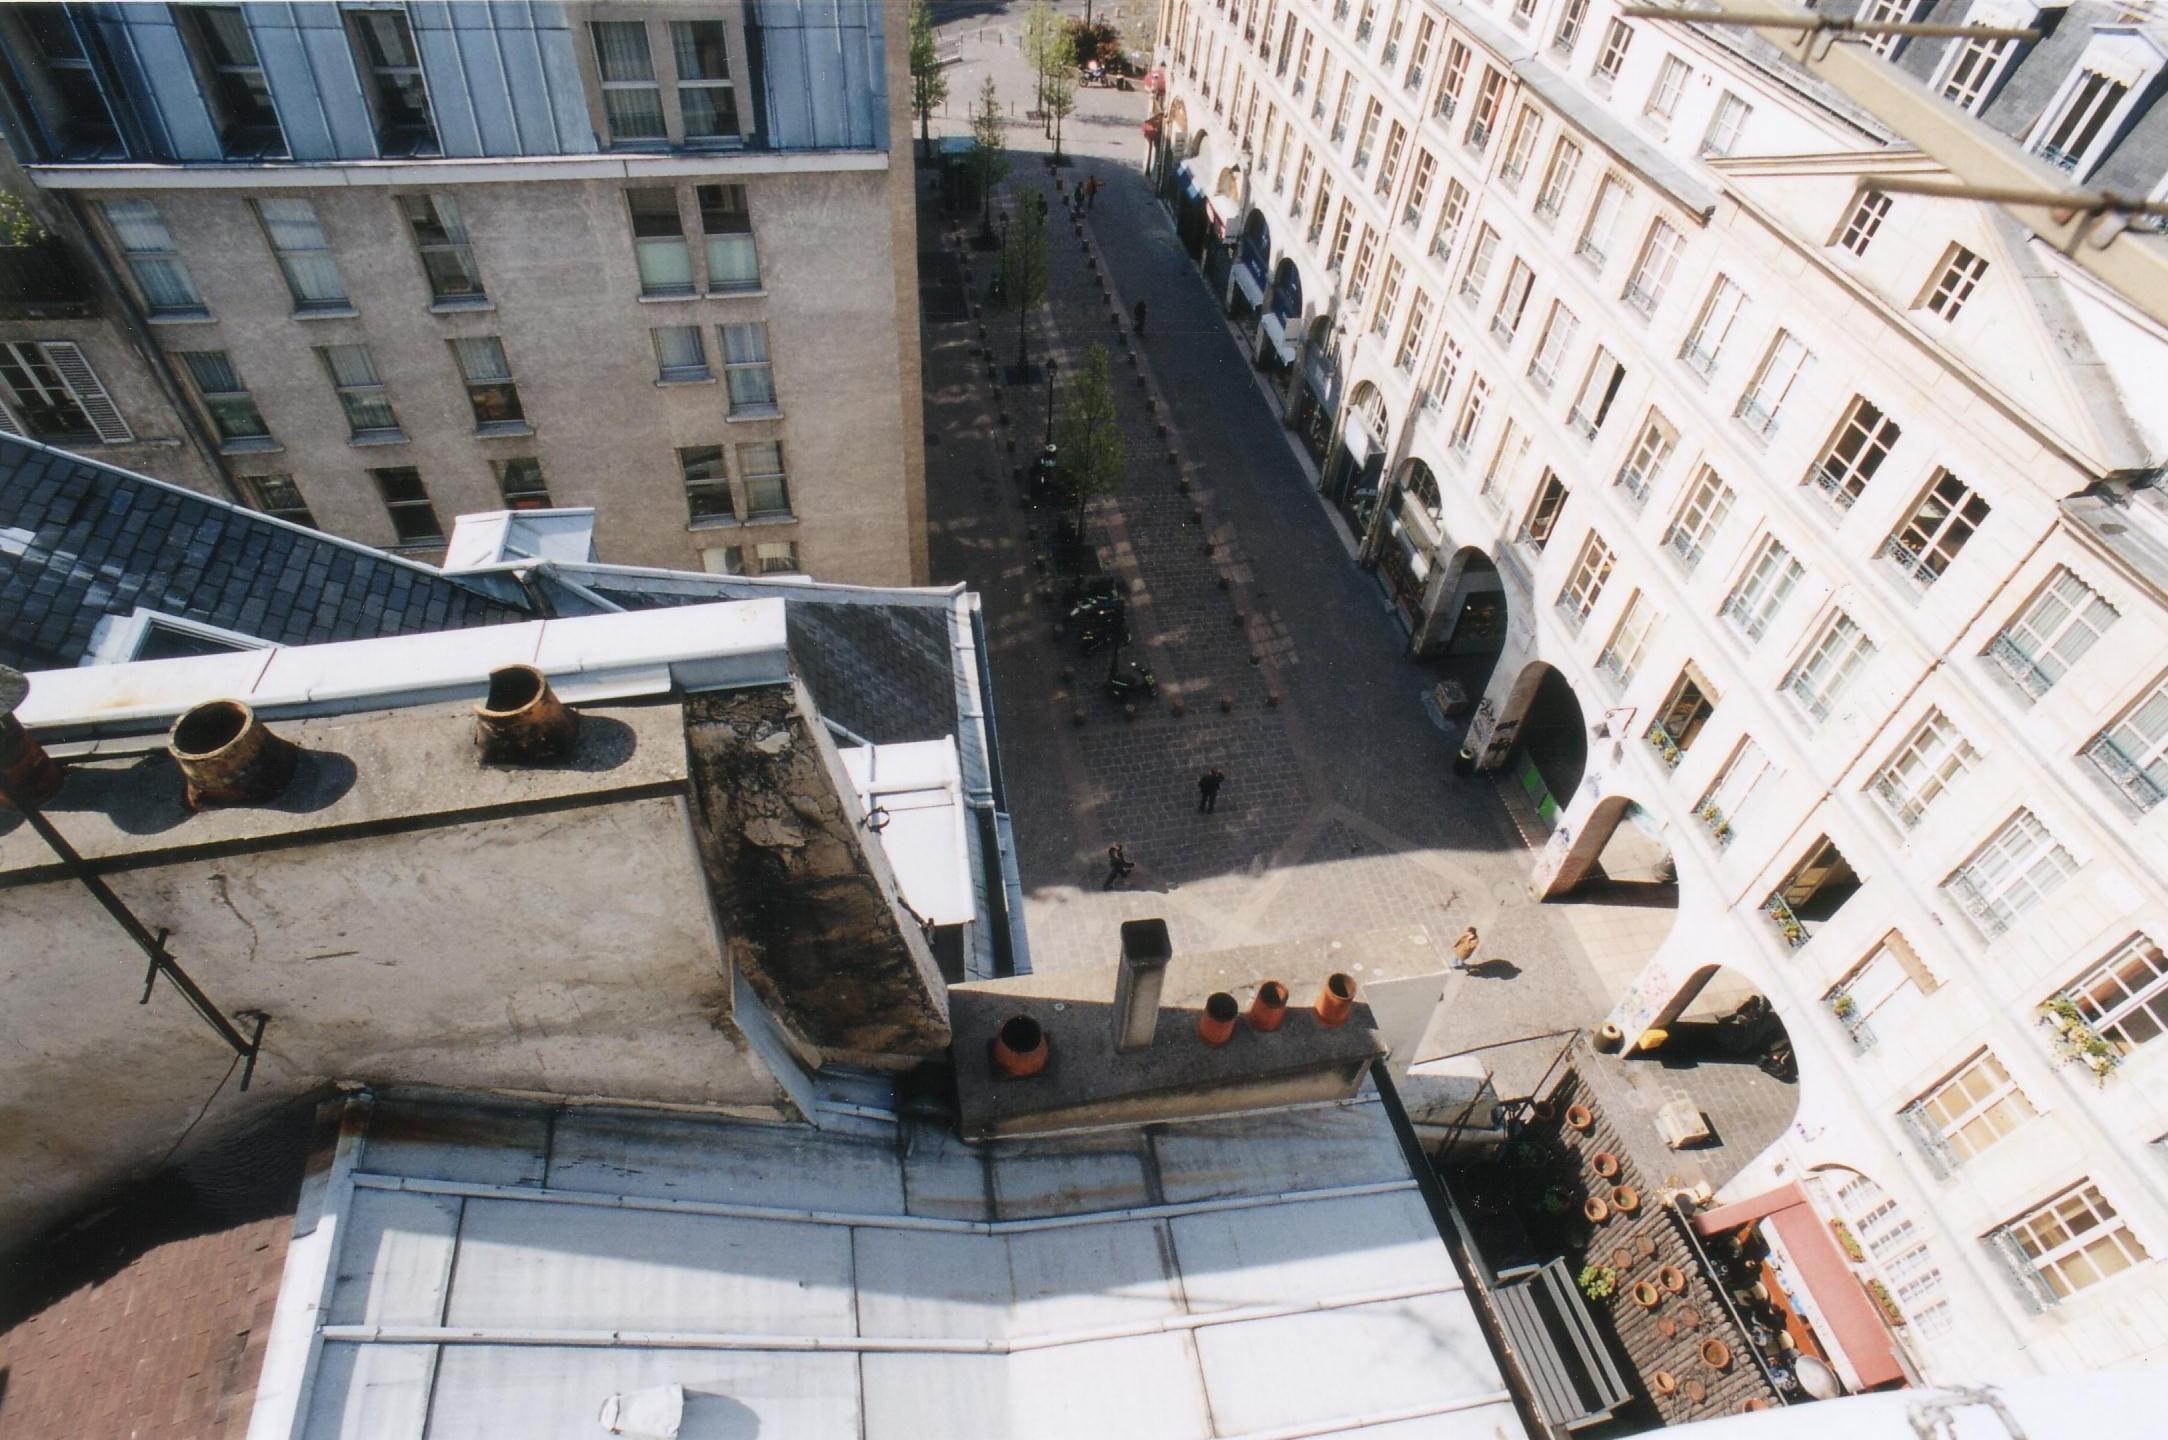 rue de la ferronnerie in paris. Black Bedroom Furniture Sets. Home Design Ideas